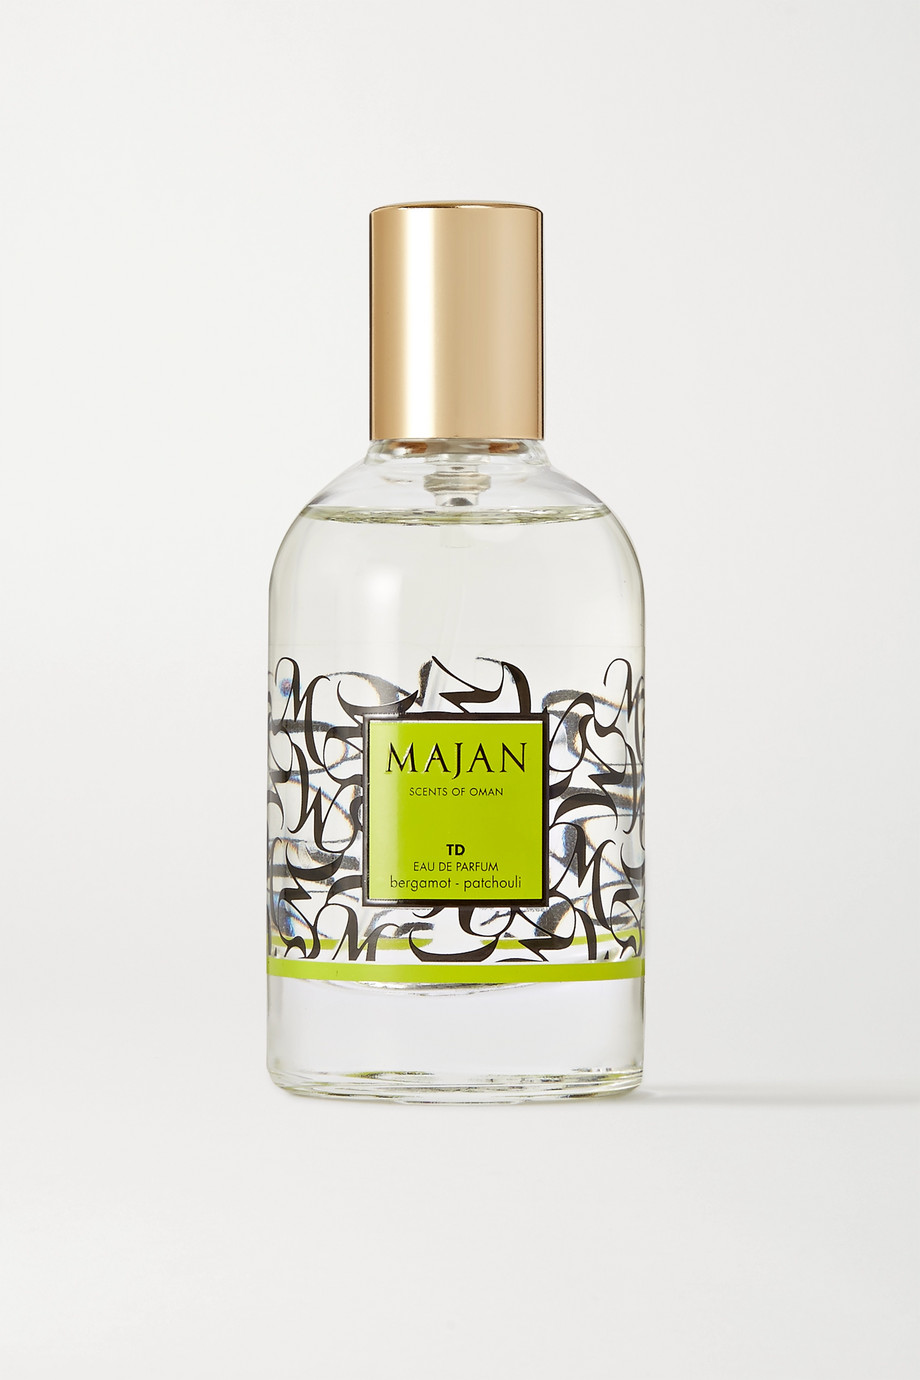 MAJAN TD, 50 ml – Eau de Parfum